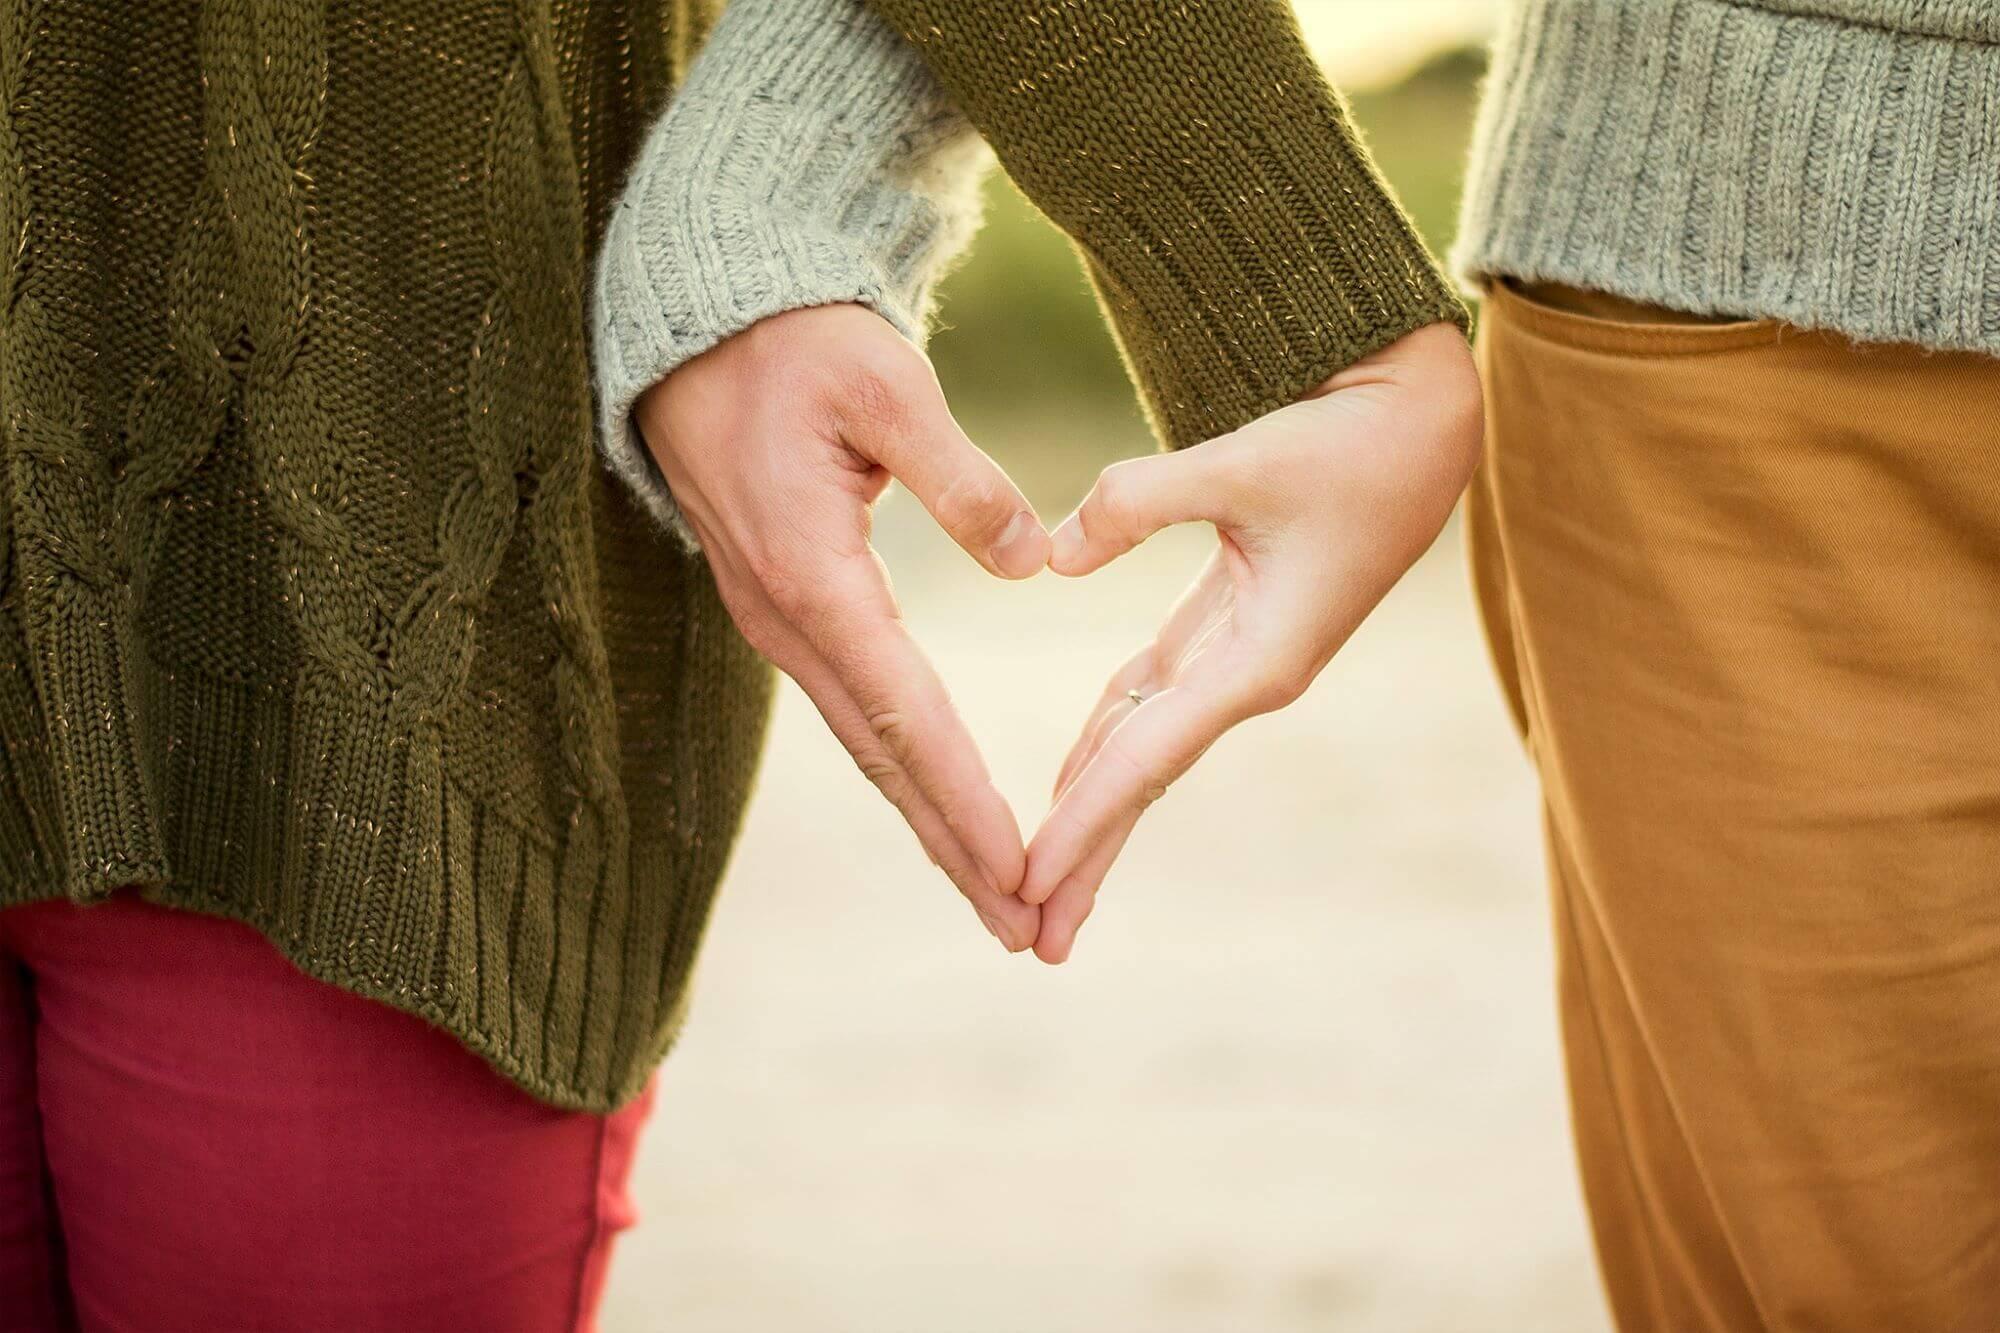 Link between Hearing Loss & Heart Disease